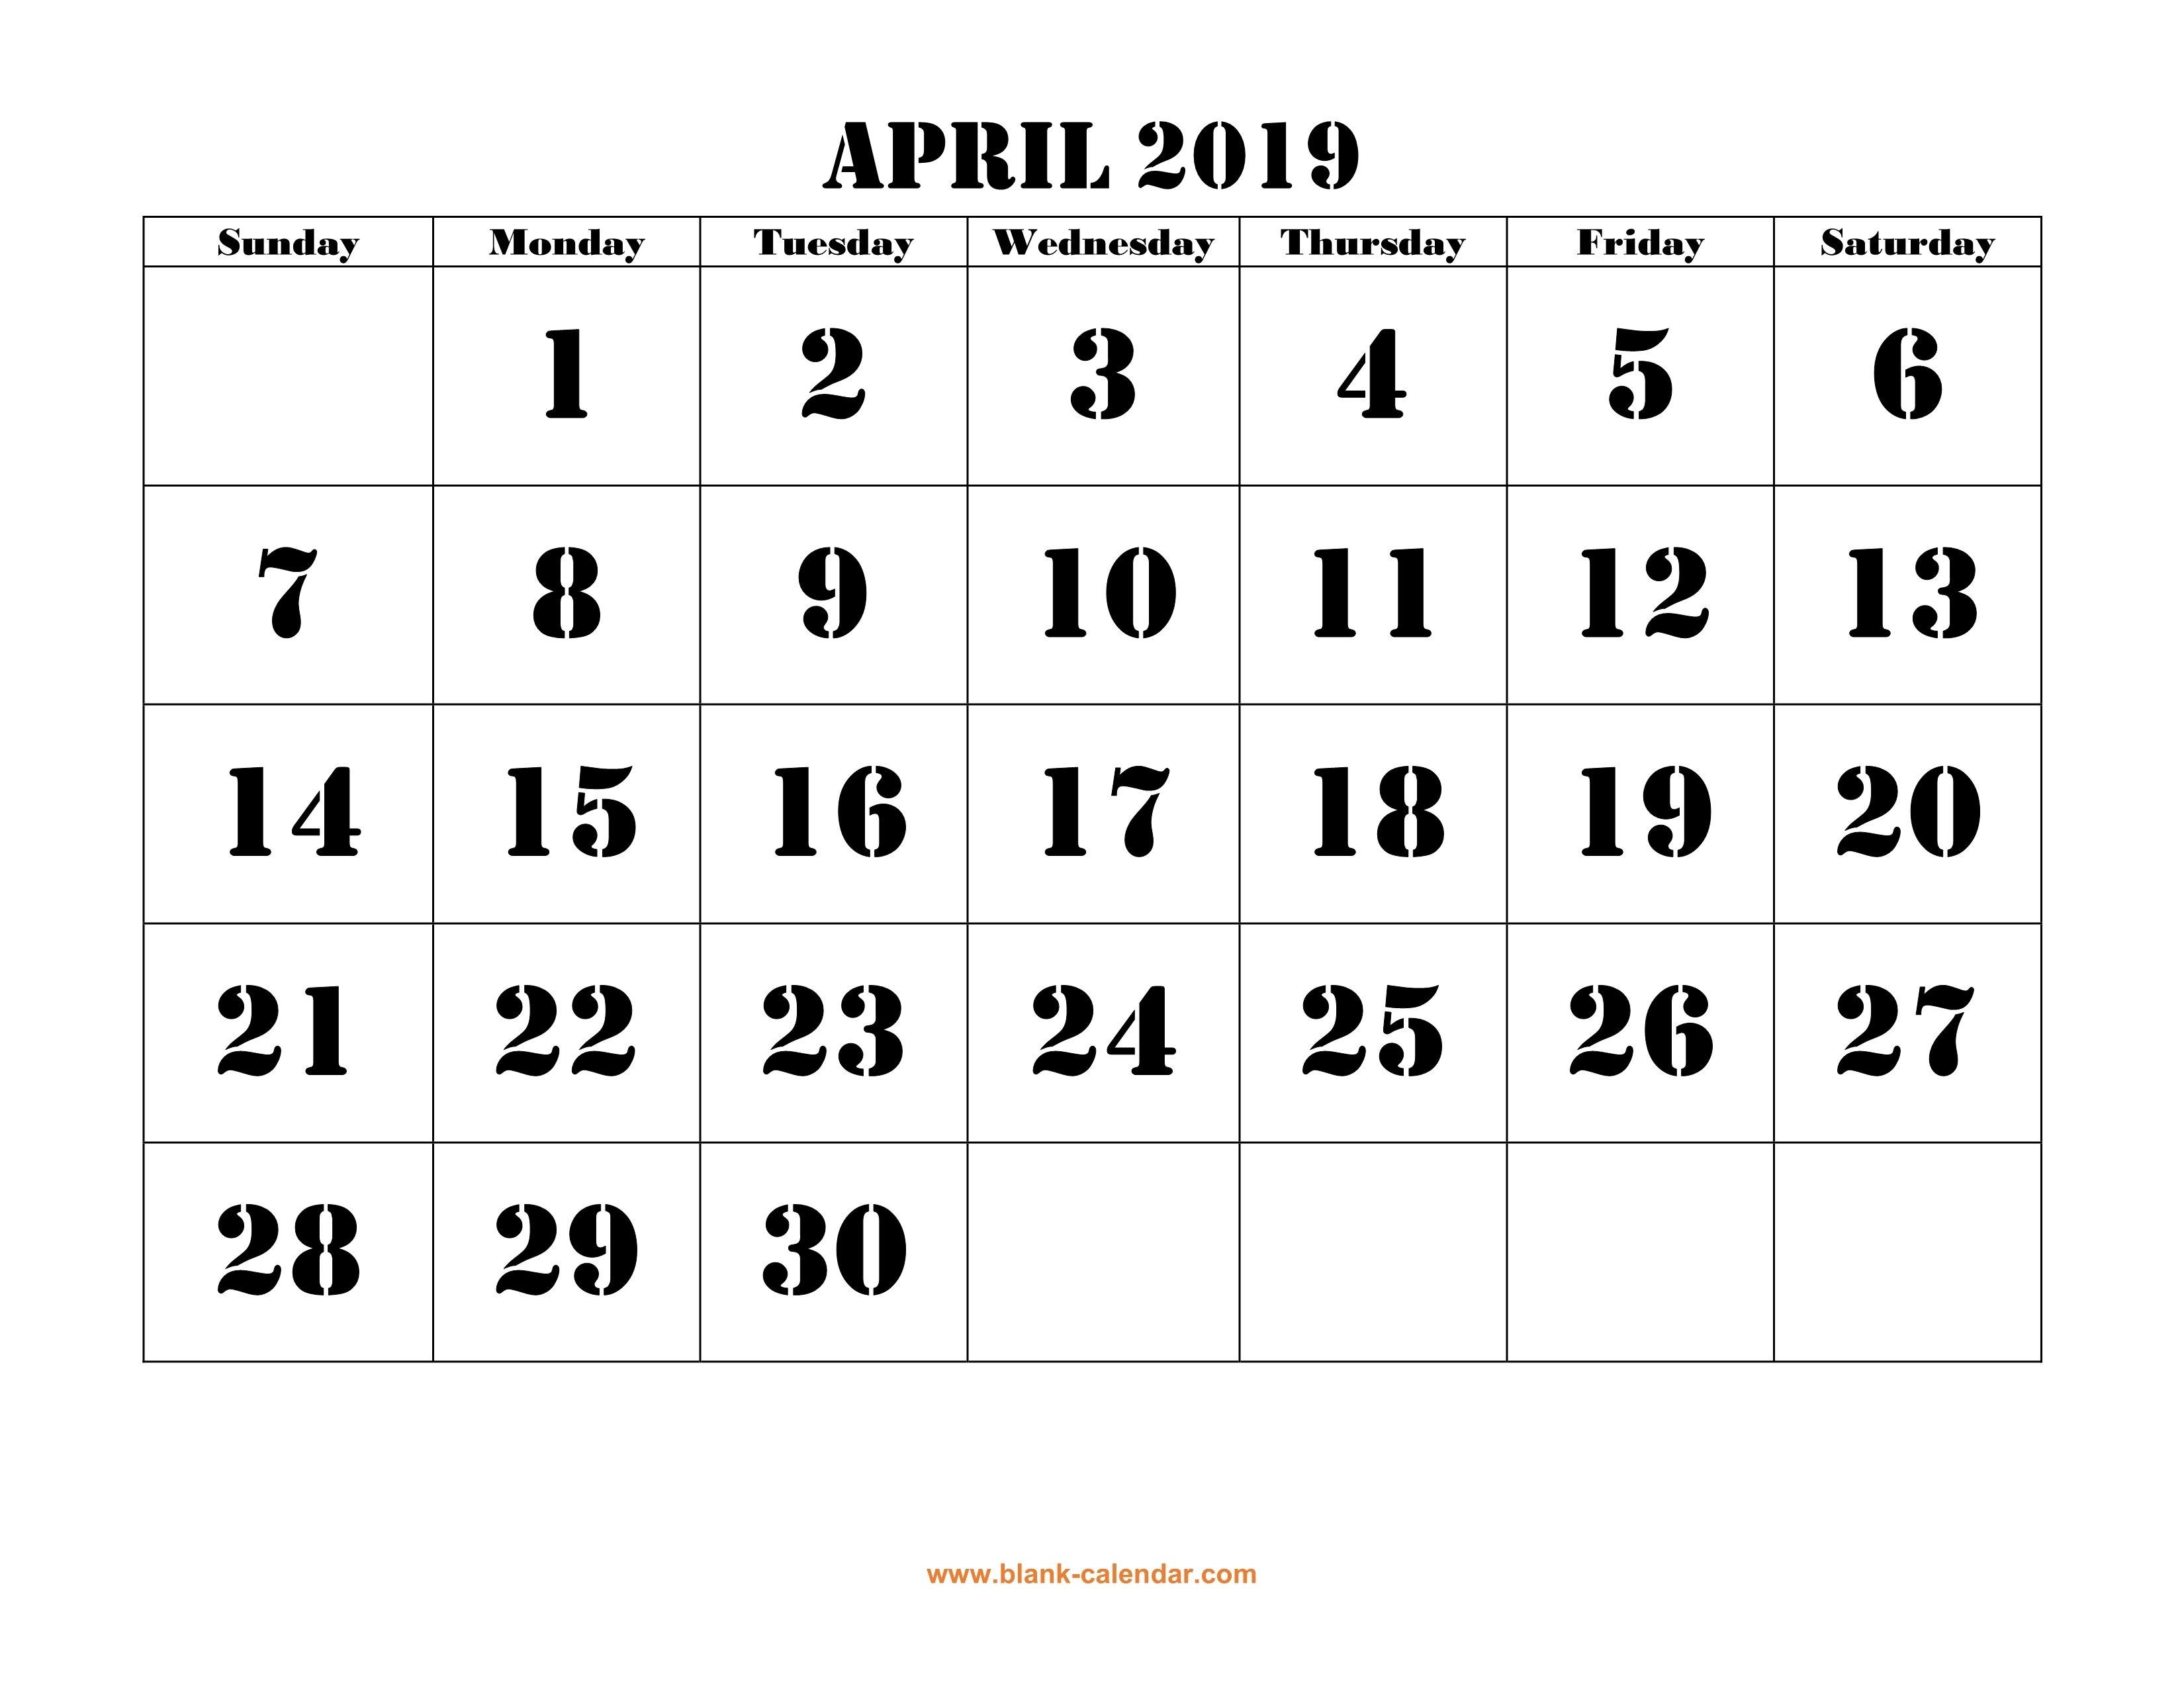 Free Download Printable April 2019 Calendar, Large Font Design Calendar April 6 2019